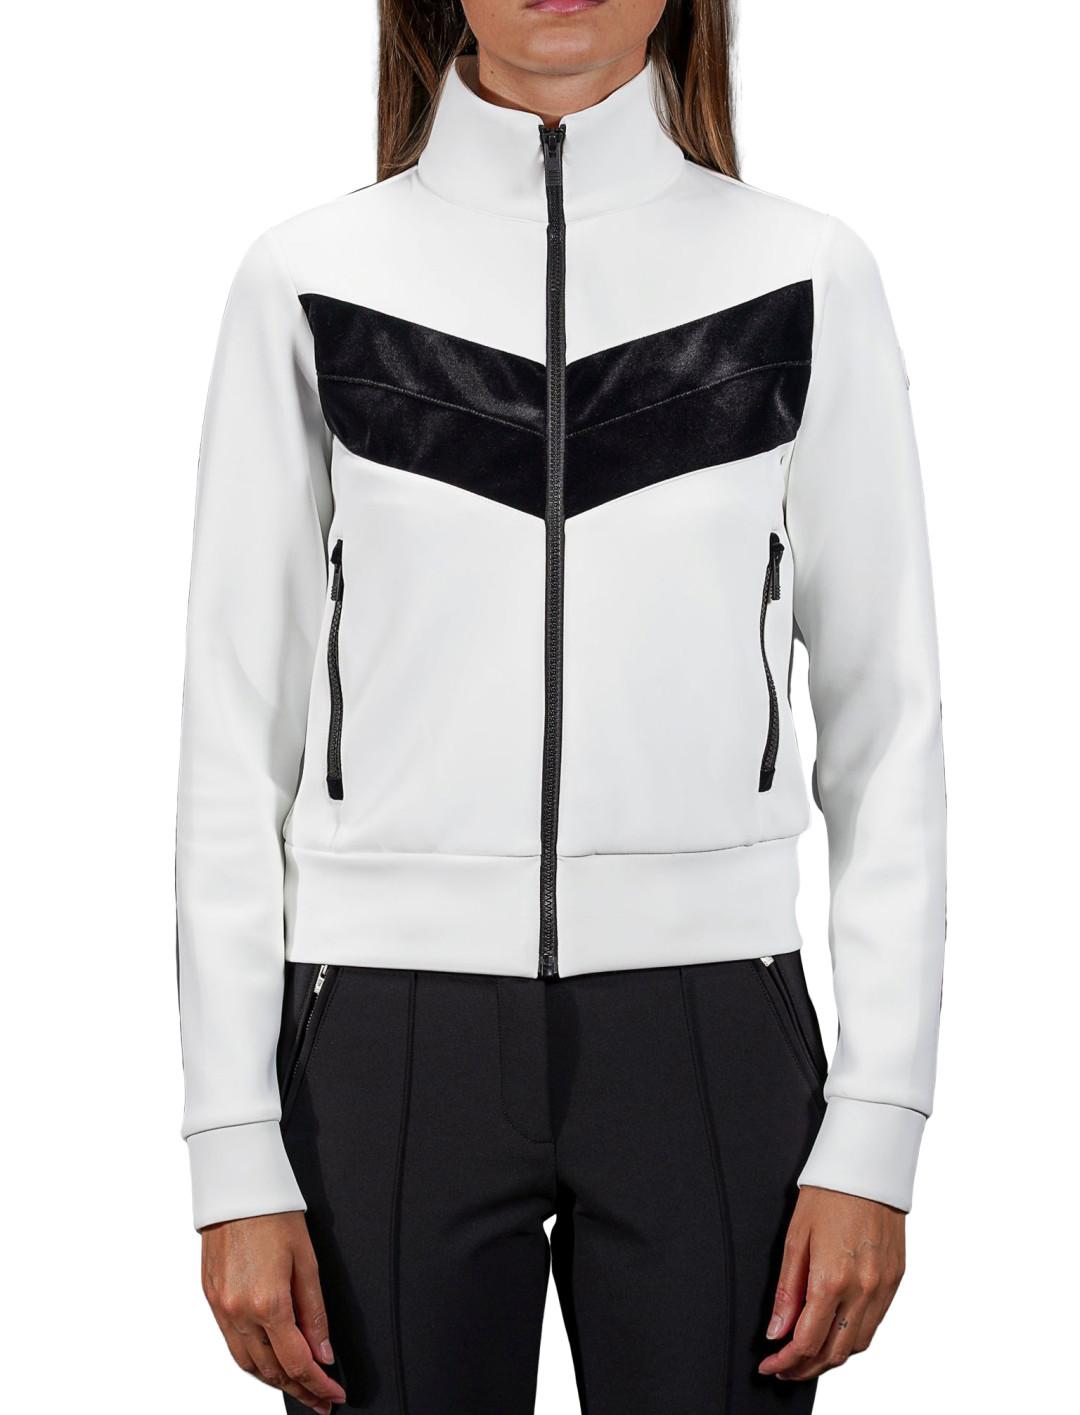 Venus Jacket Clothing